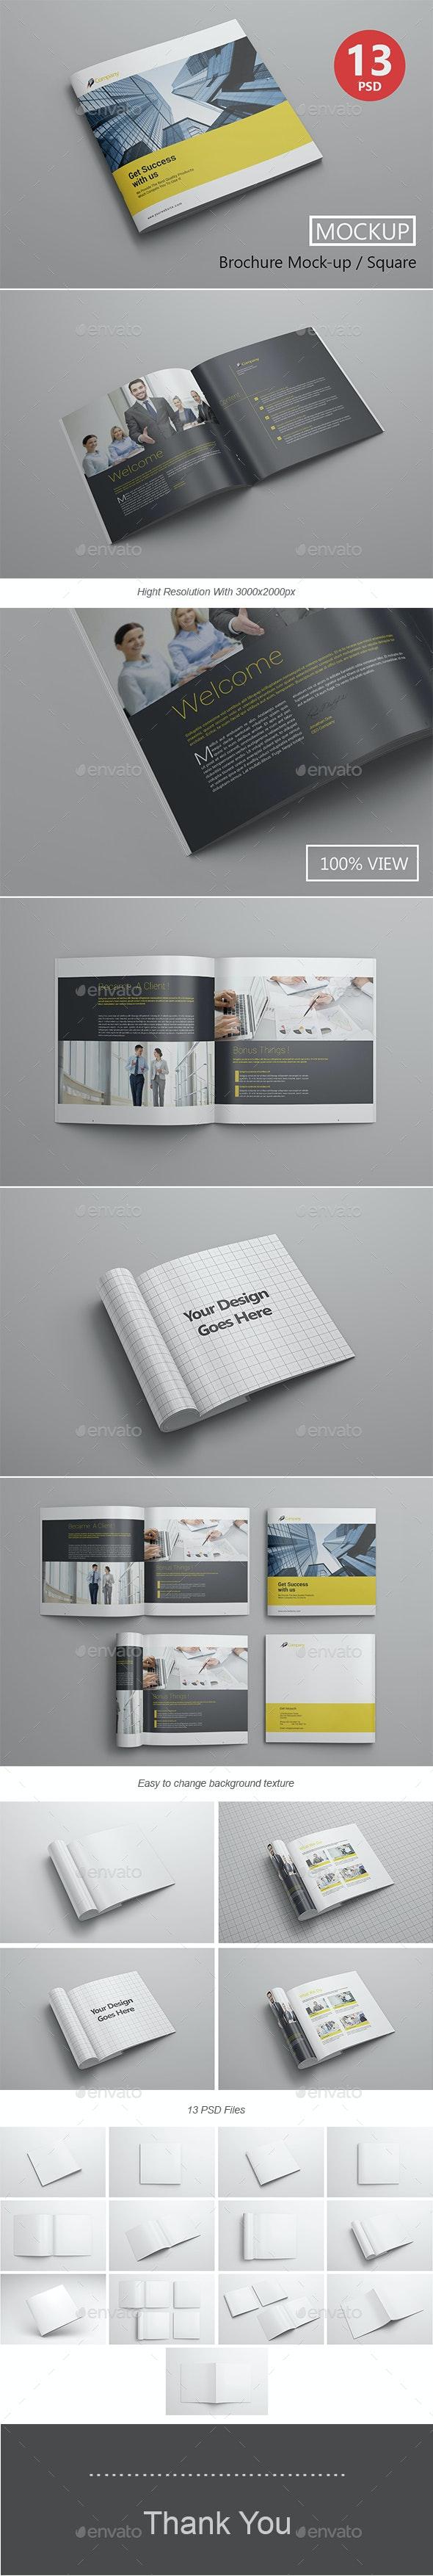 Brochure Mockup / Square - Product Mock-Ups Graphics